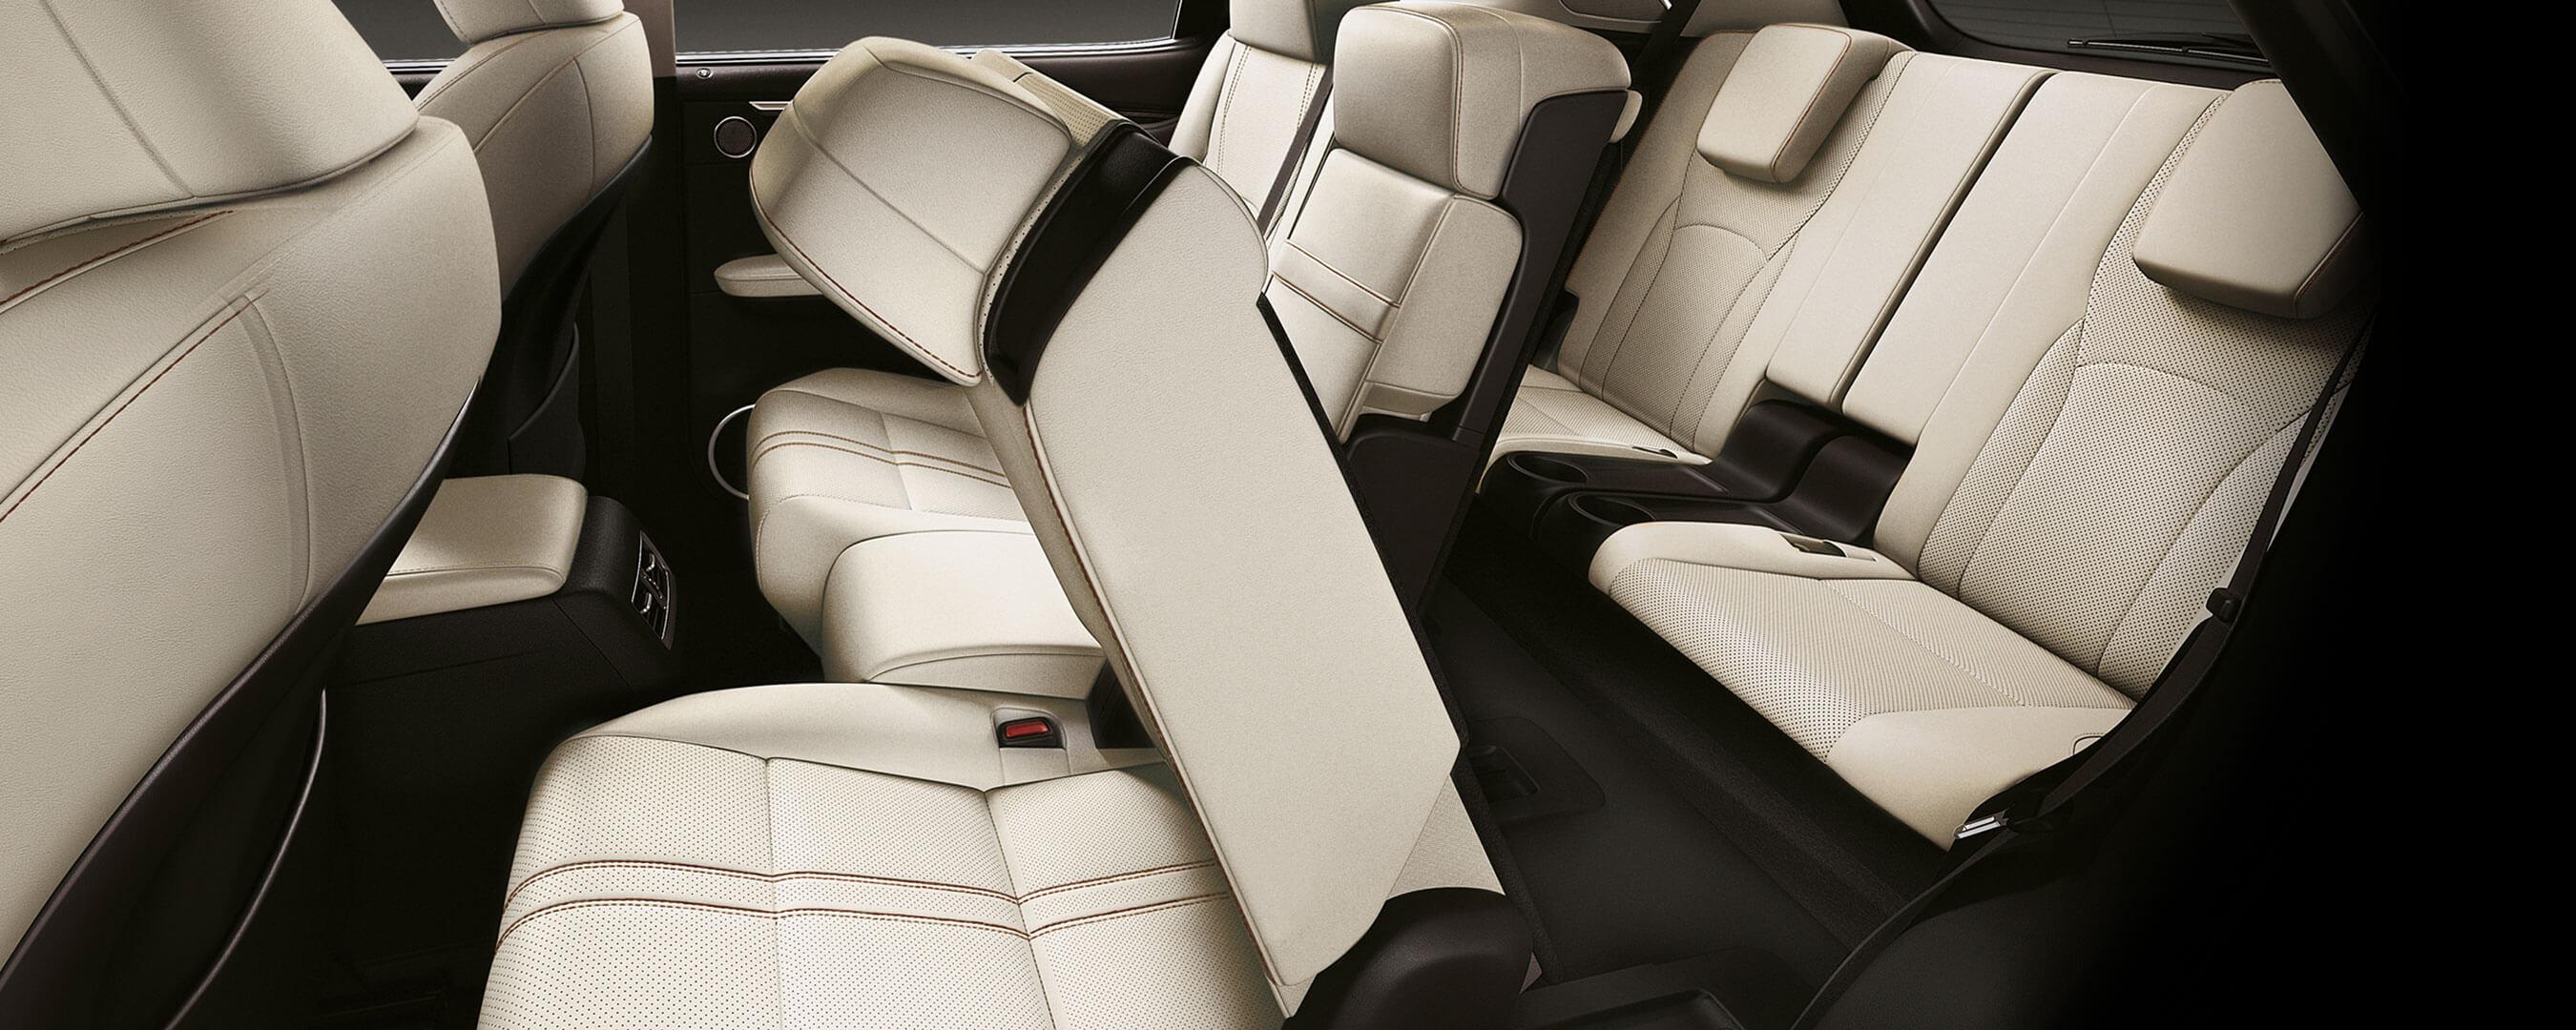 2019 lexus rxl experience rear interior